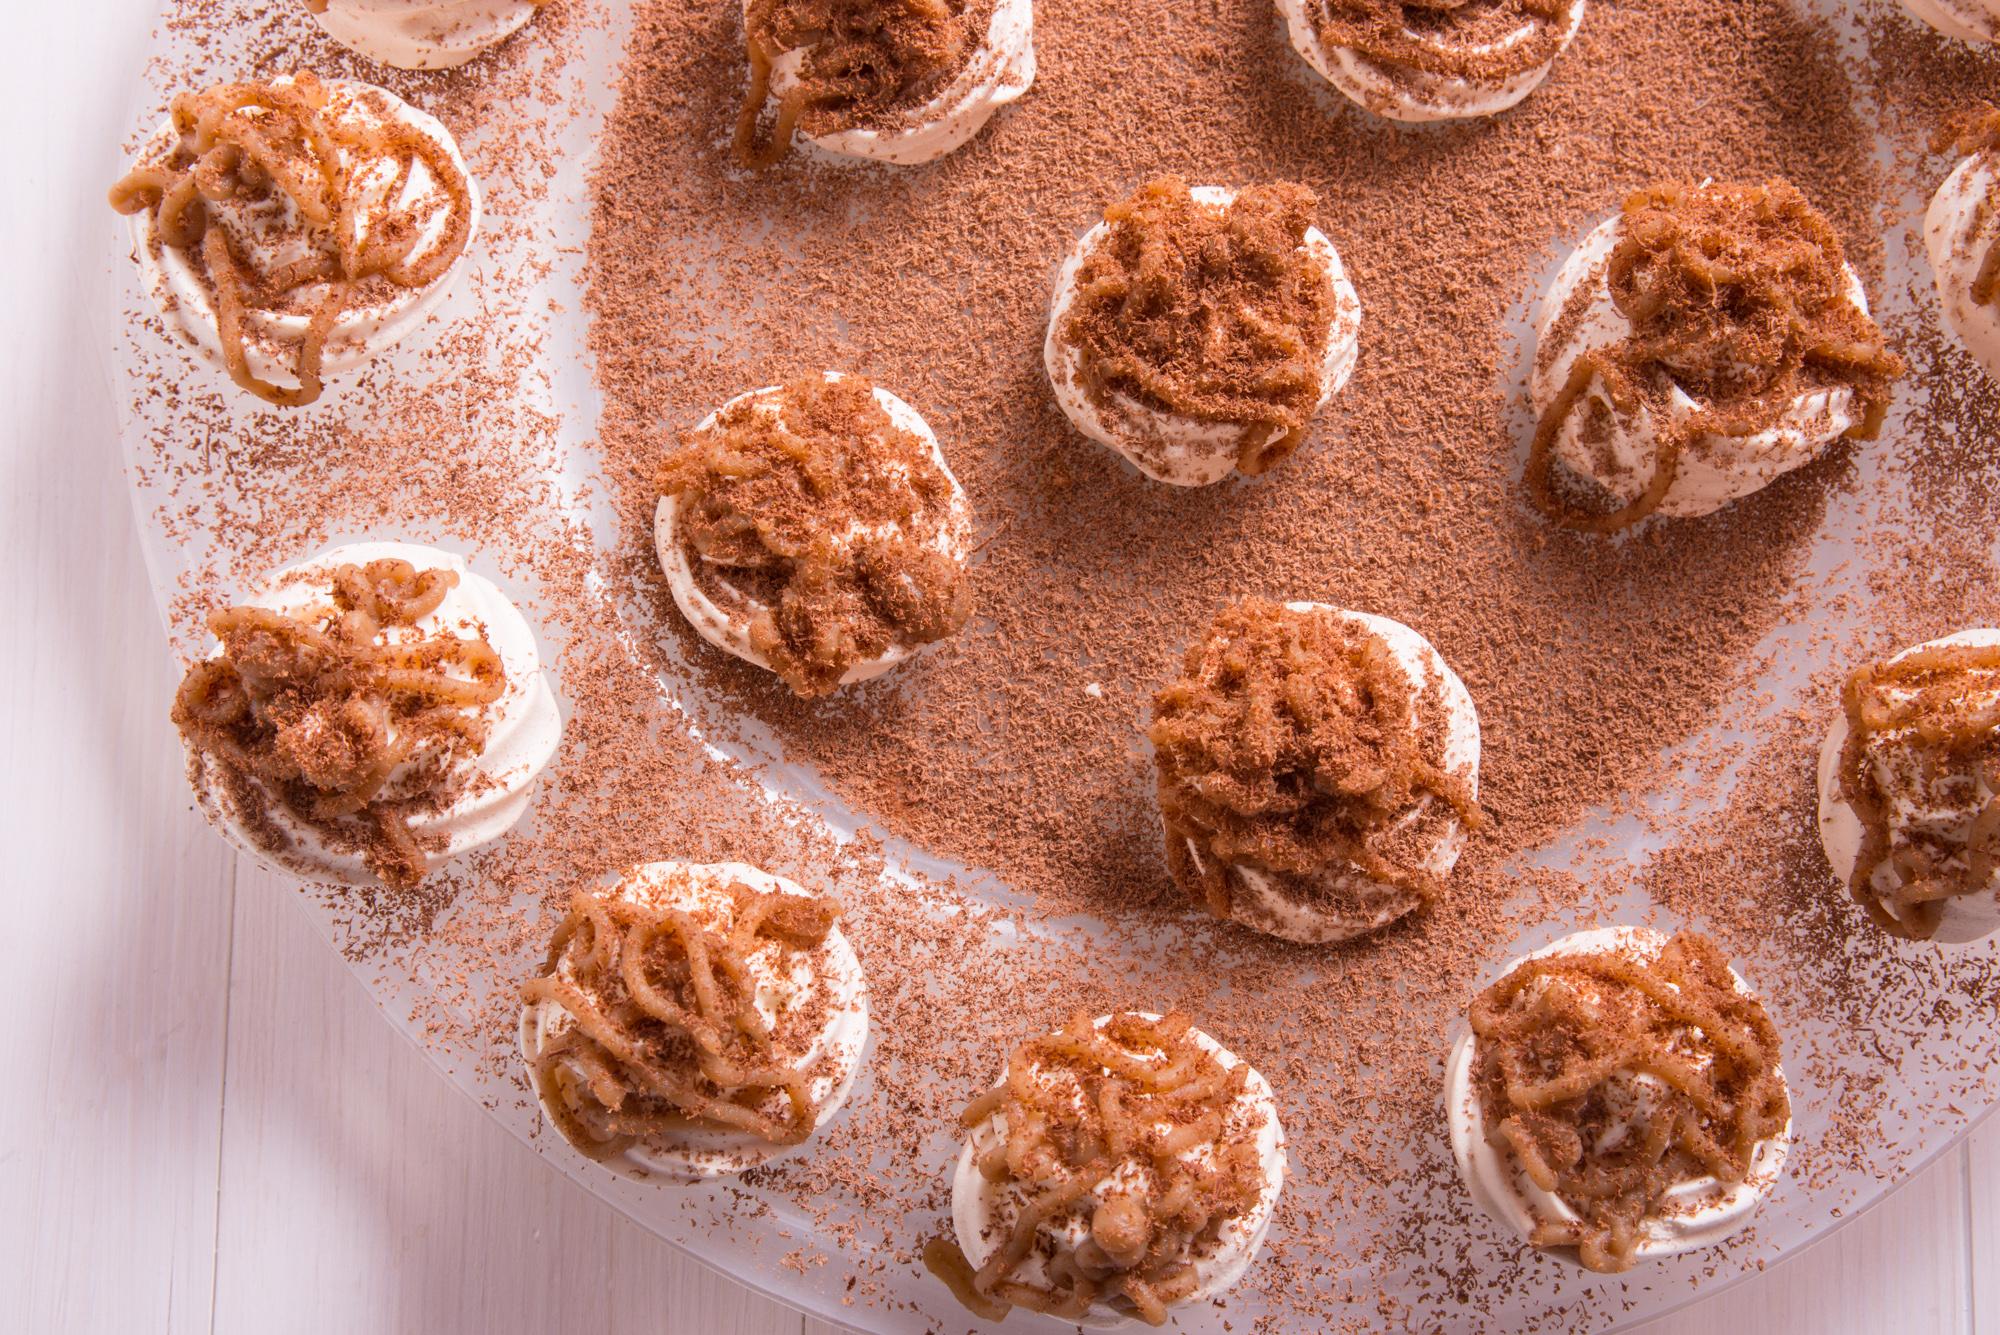 FODMAP friendly gluten free mini mont blanc dessert recipe